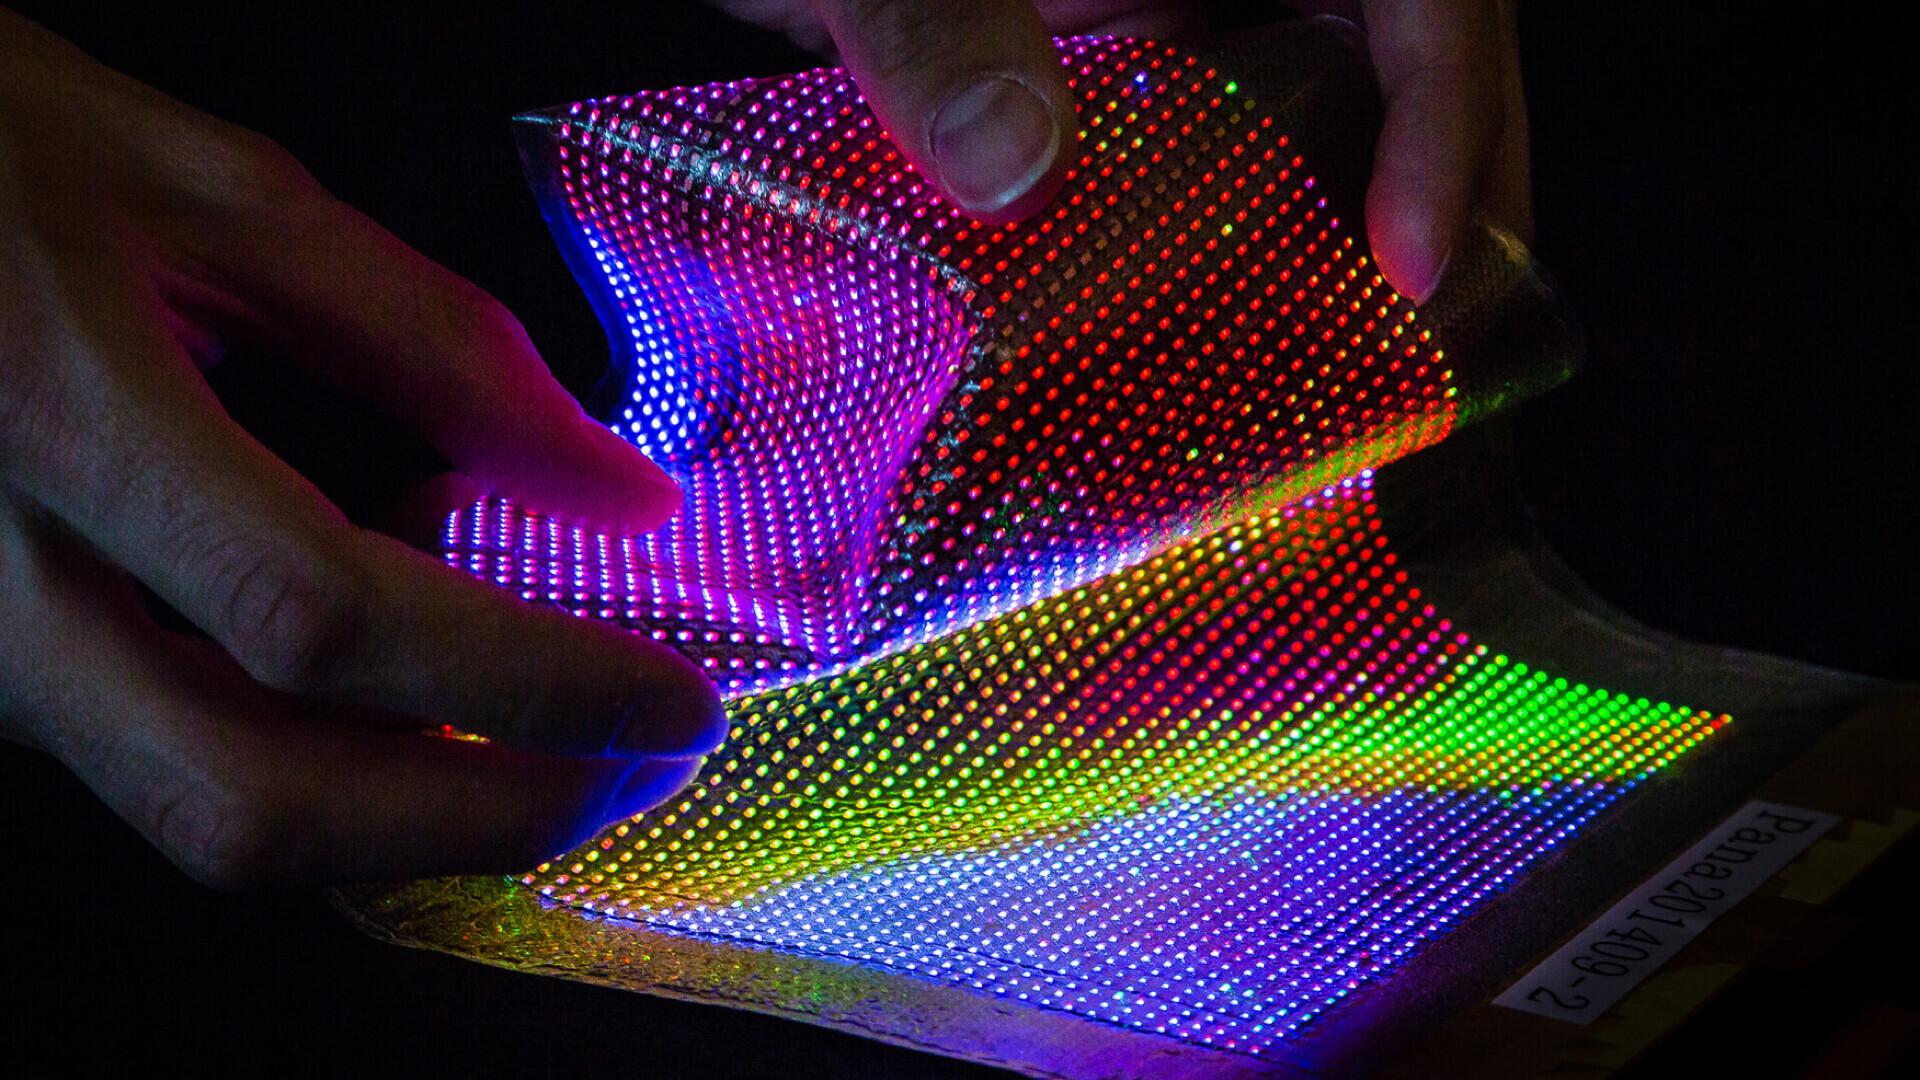 Flexible Electronics and Smart Textiles